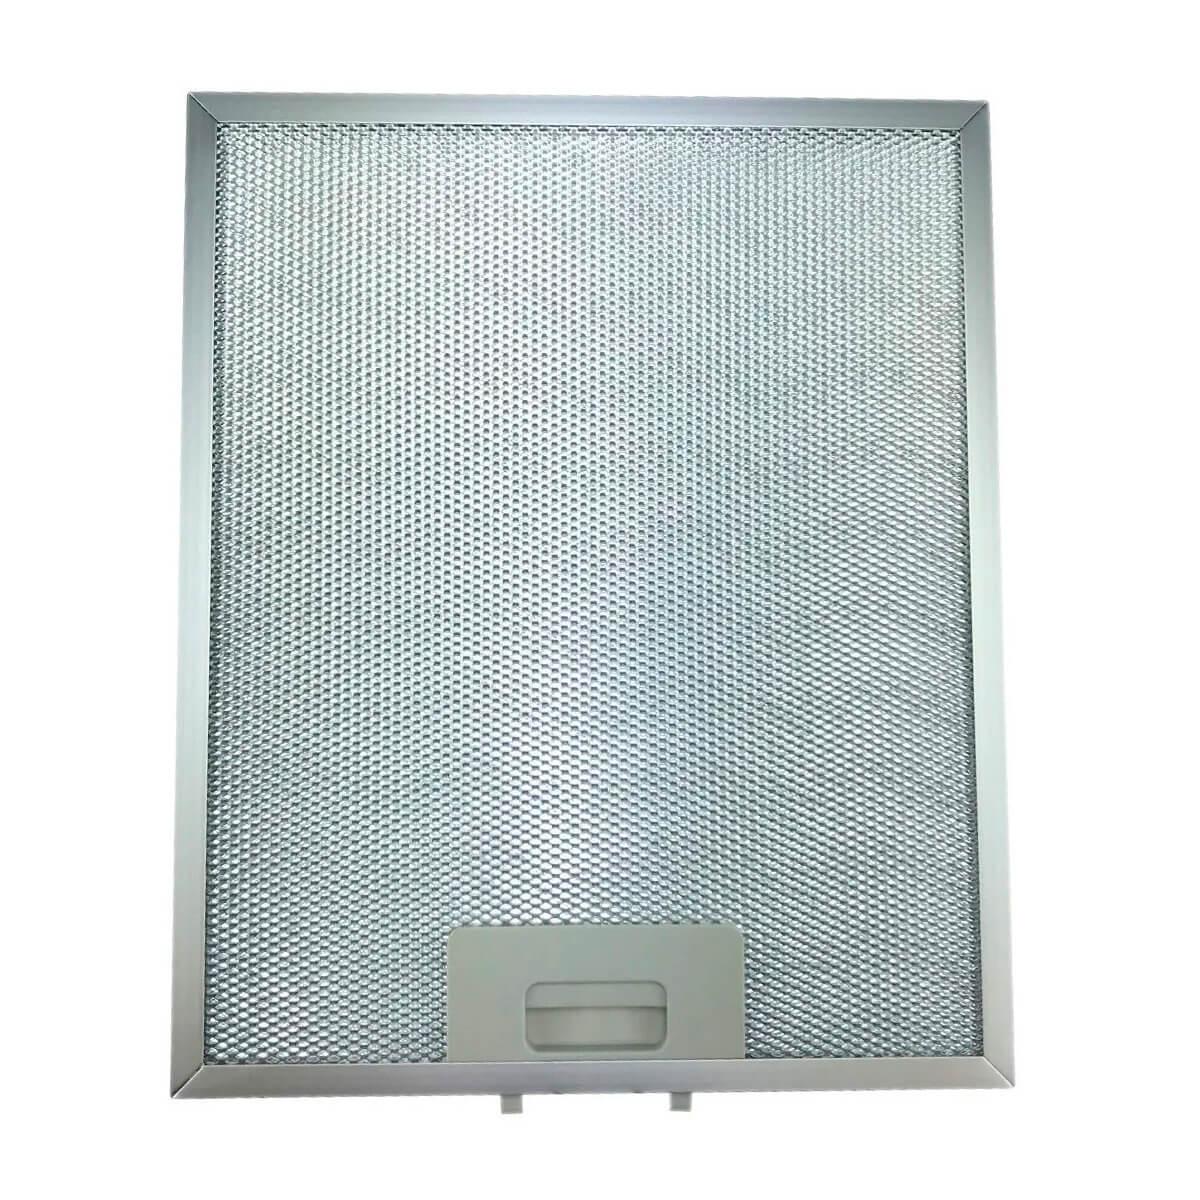 Kit Com 2 Filtros De Alumínio Para Coifa De Parede Electrolux - A13543601